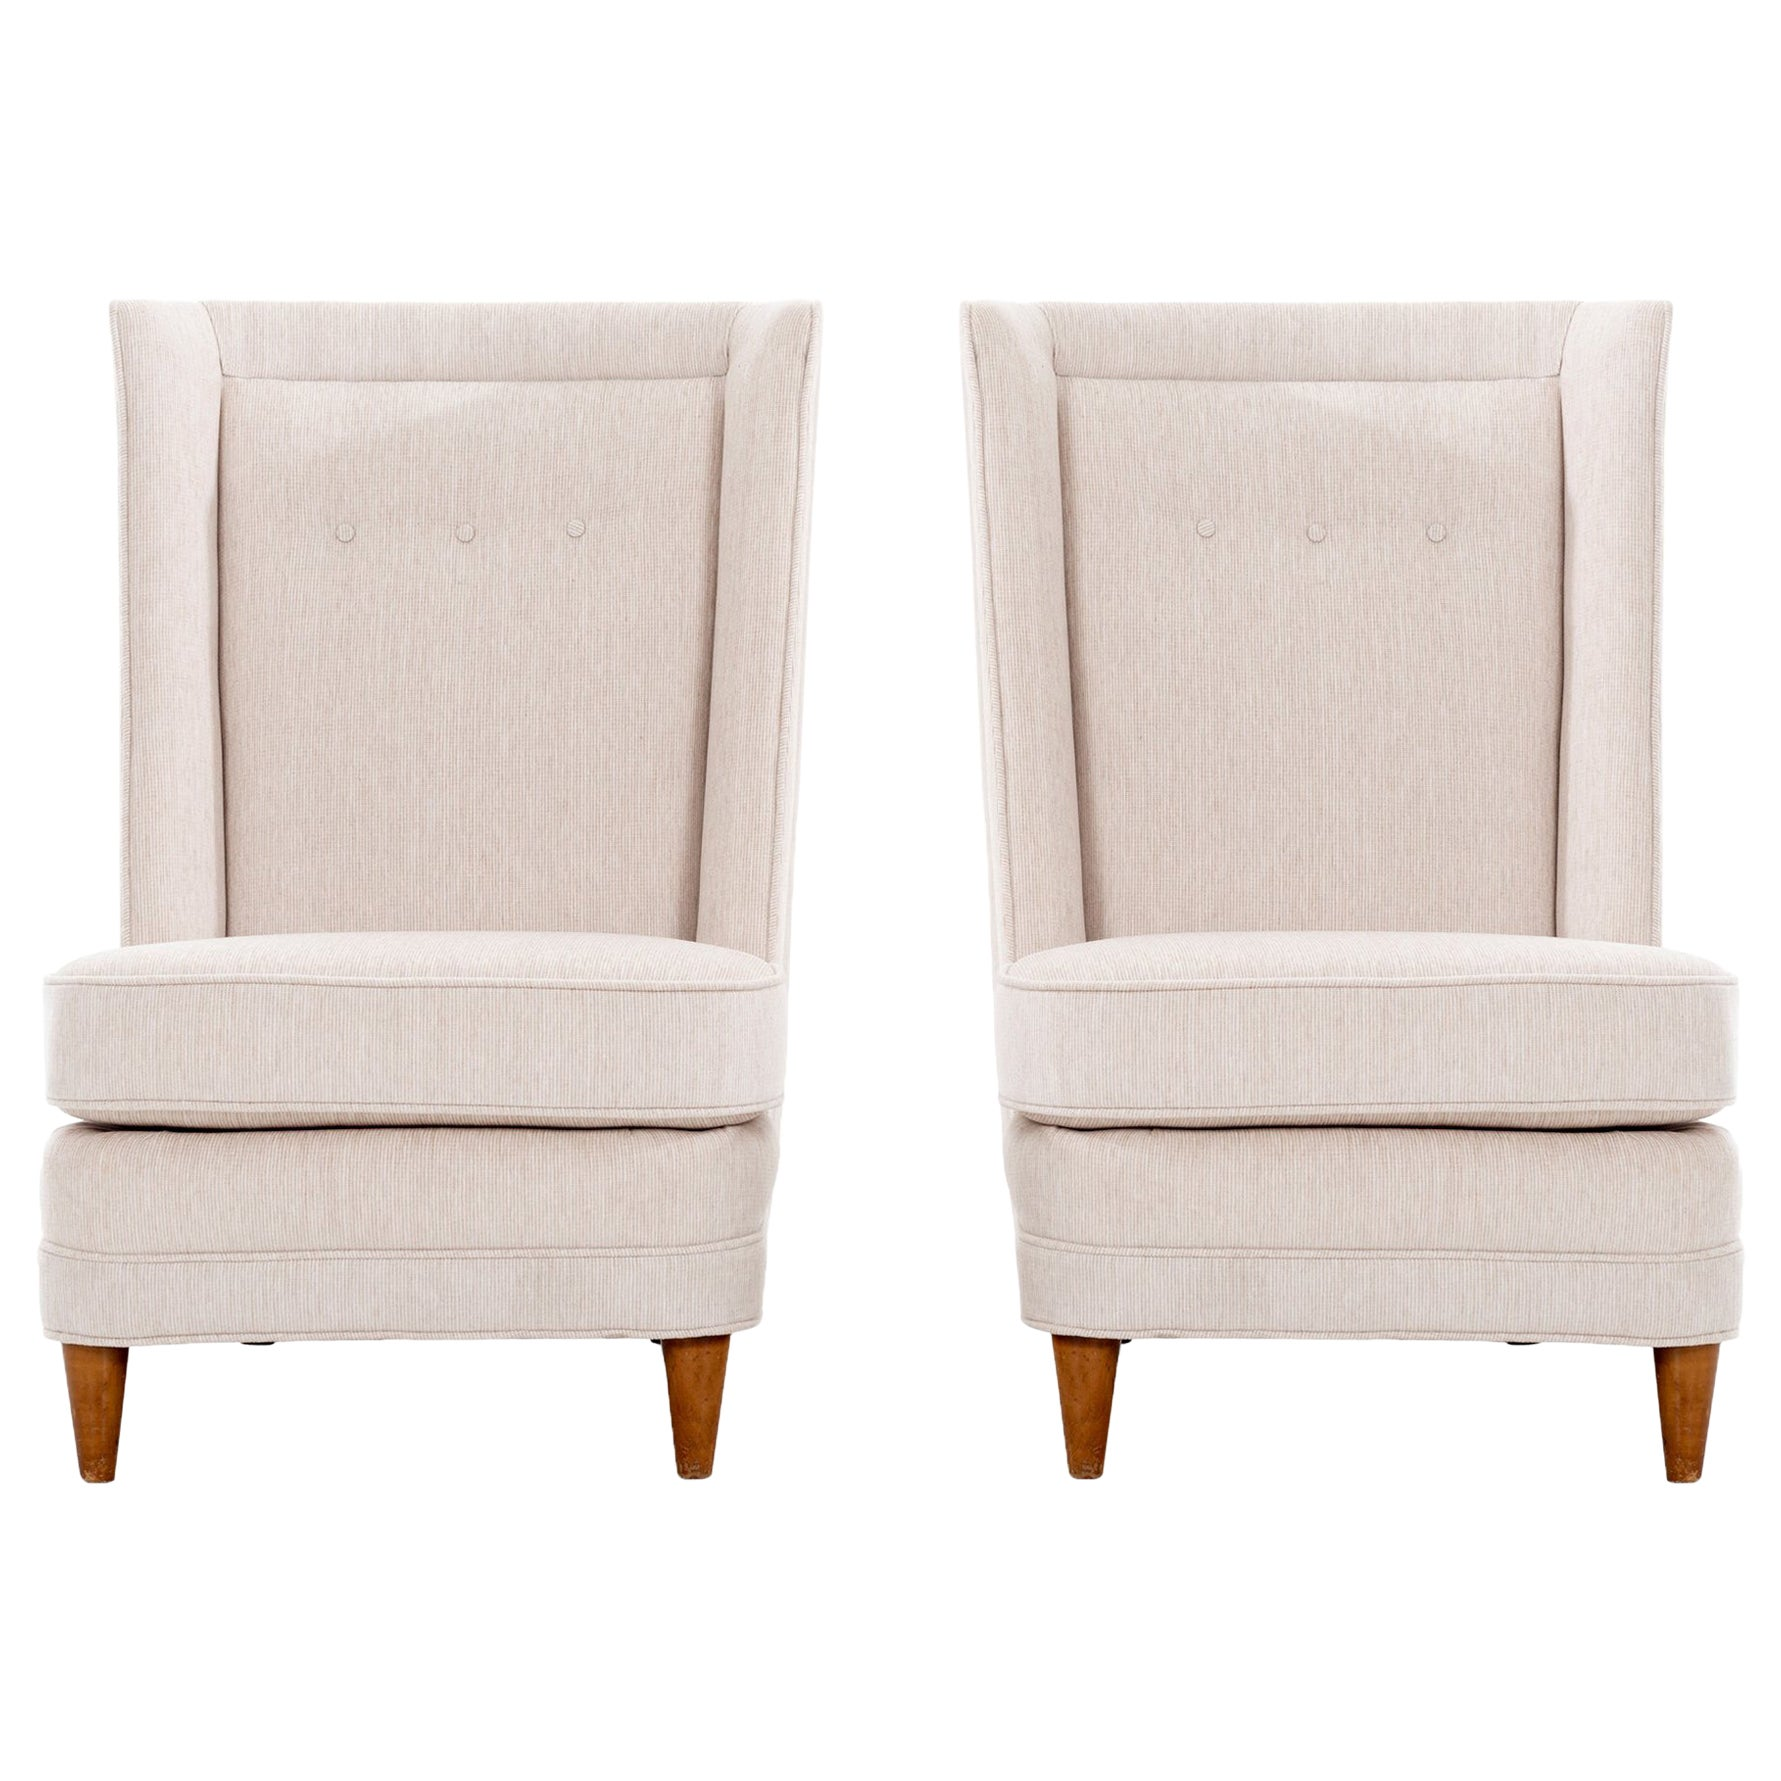 Paul Laszlo Style High-Back Lounge Chairs